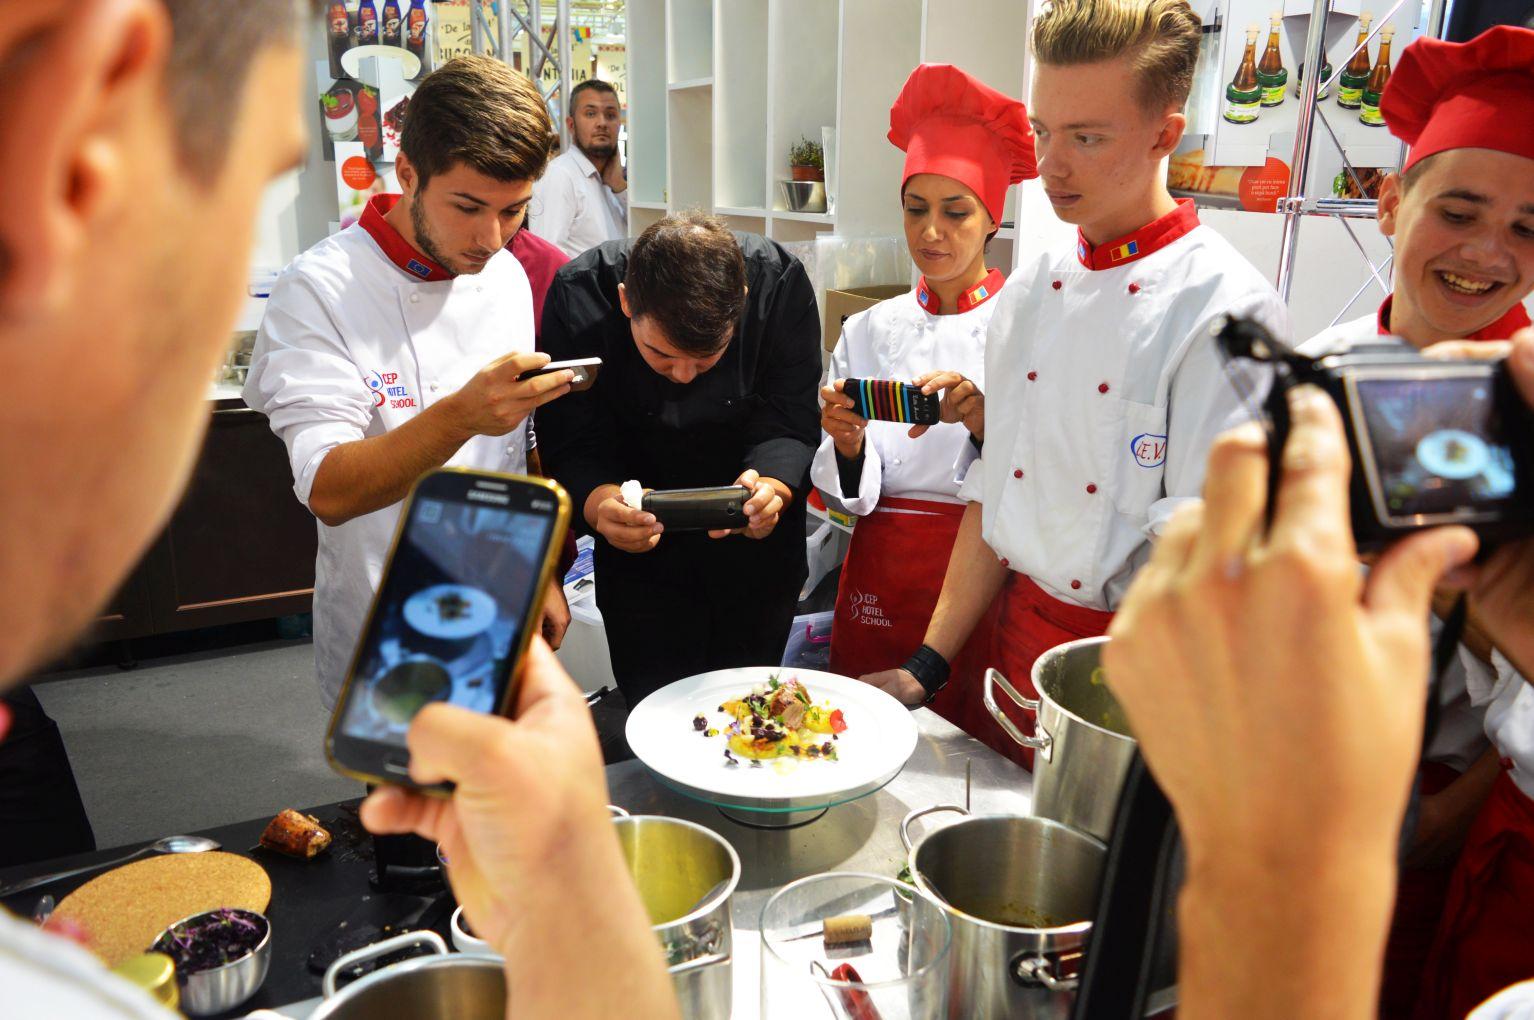 Sarbatoarea-Gustului-Indagra-Unilever-Food-Solution-Chef-Robert-si-Chef-Laszlo-08